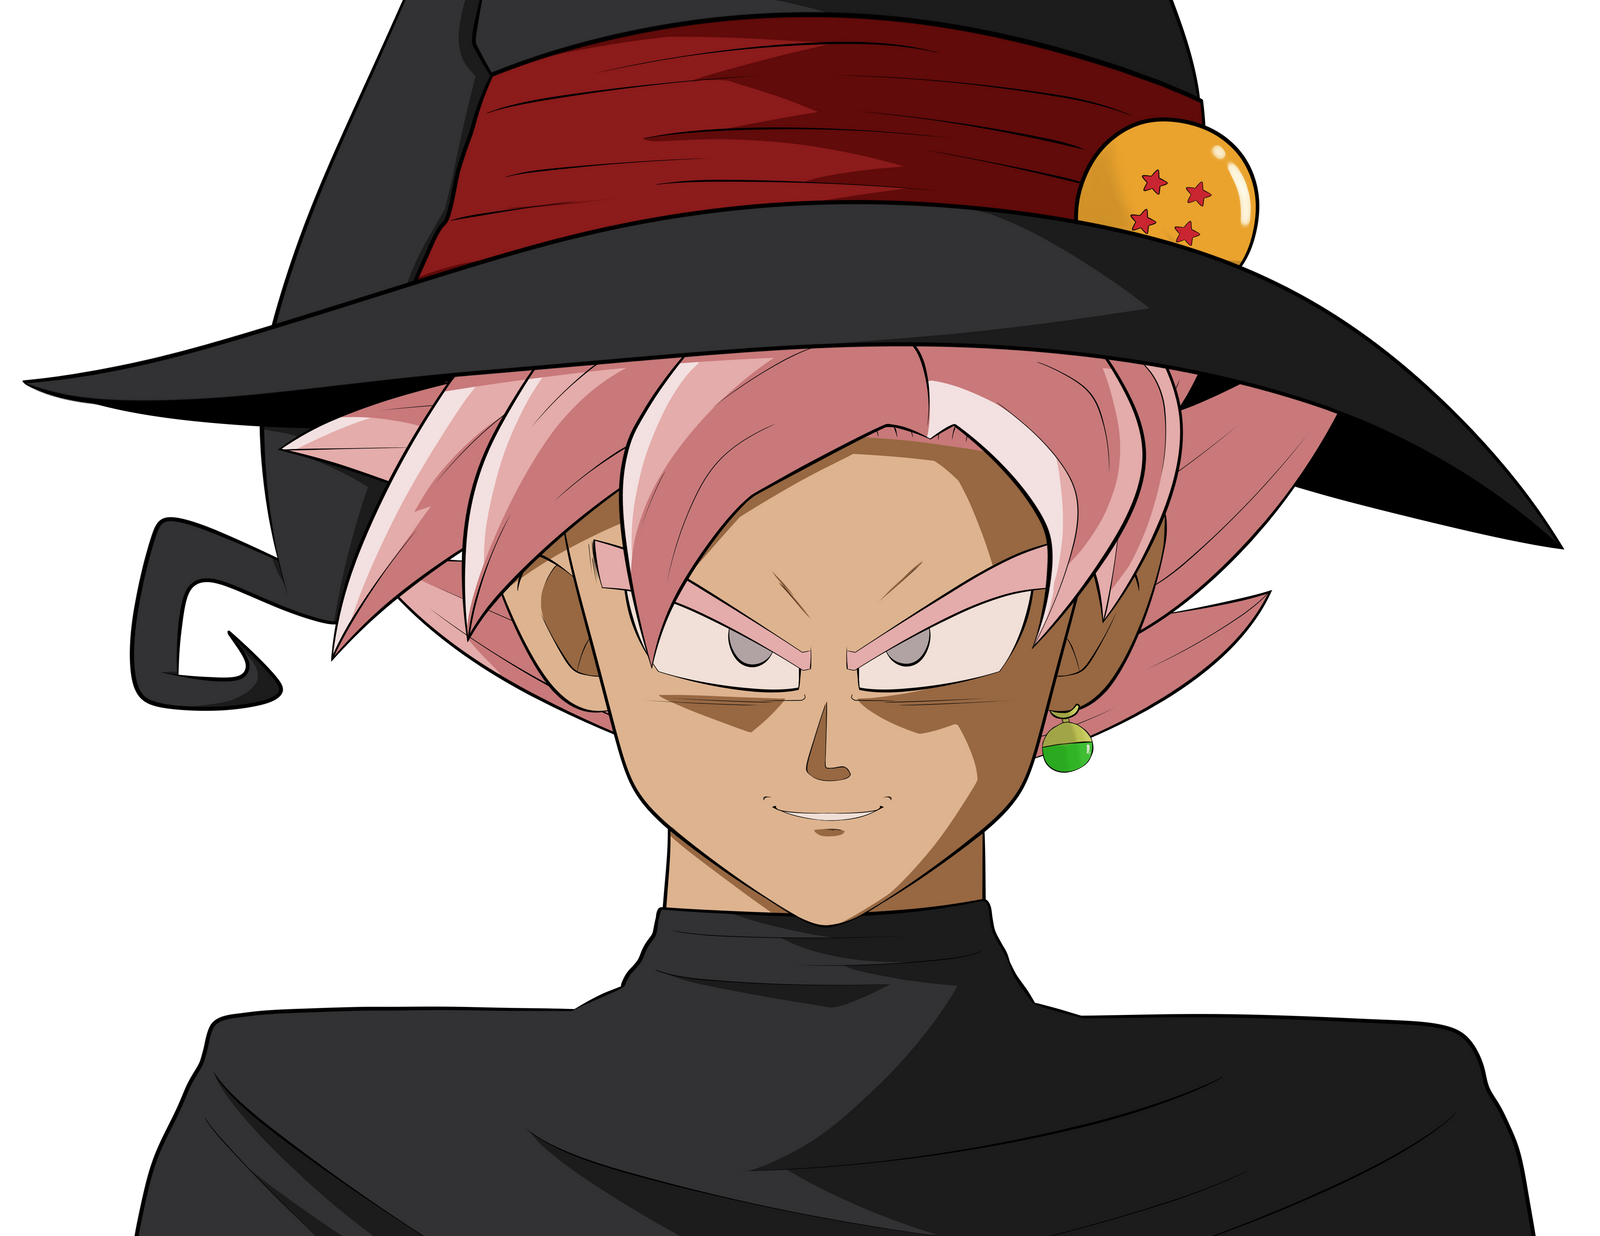 Goku Black Ssj Rose Para Colorear: Goku Black Super Saiyan Rose Halloween By EatMyMaymays On